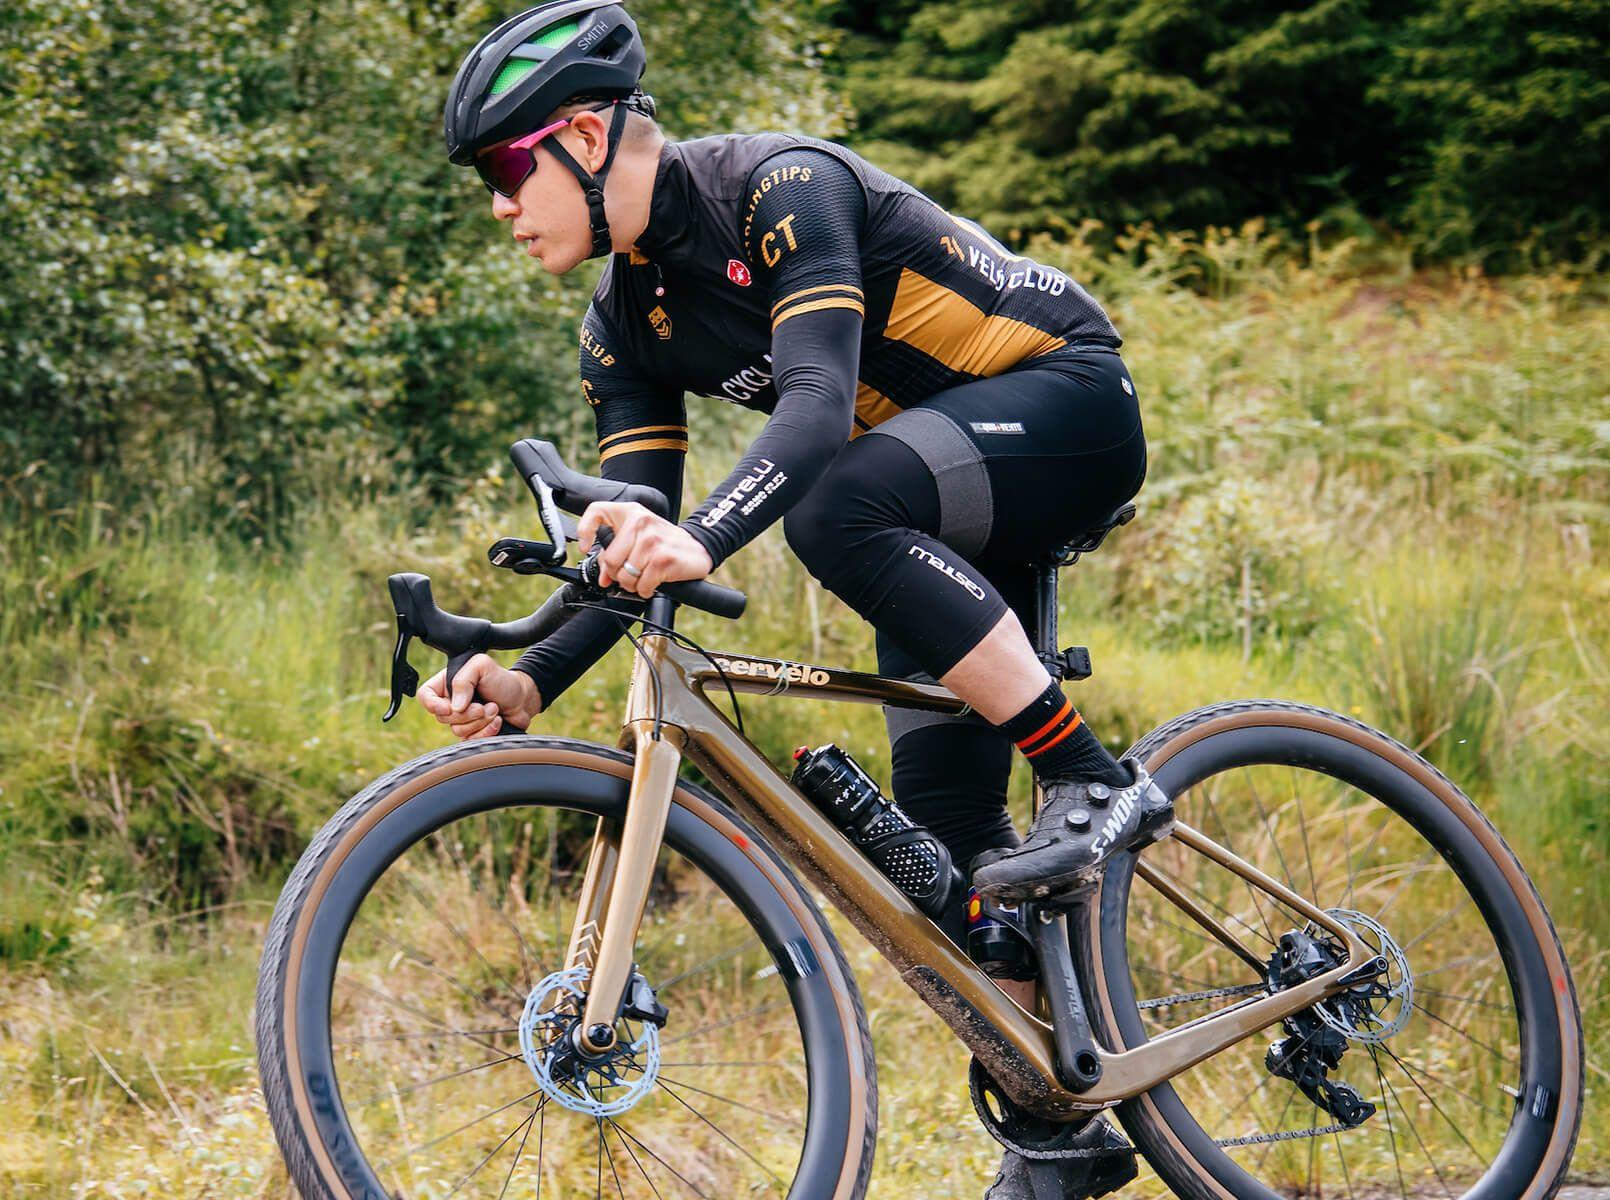 Aspero Gravel Bike Bicycles Gravel Bike Bicycle